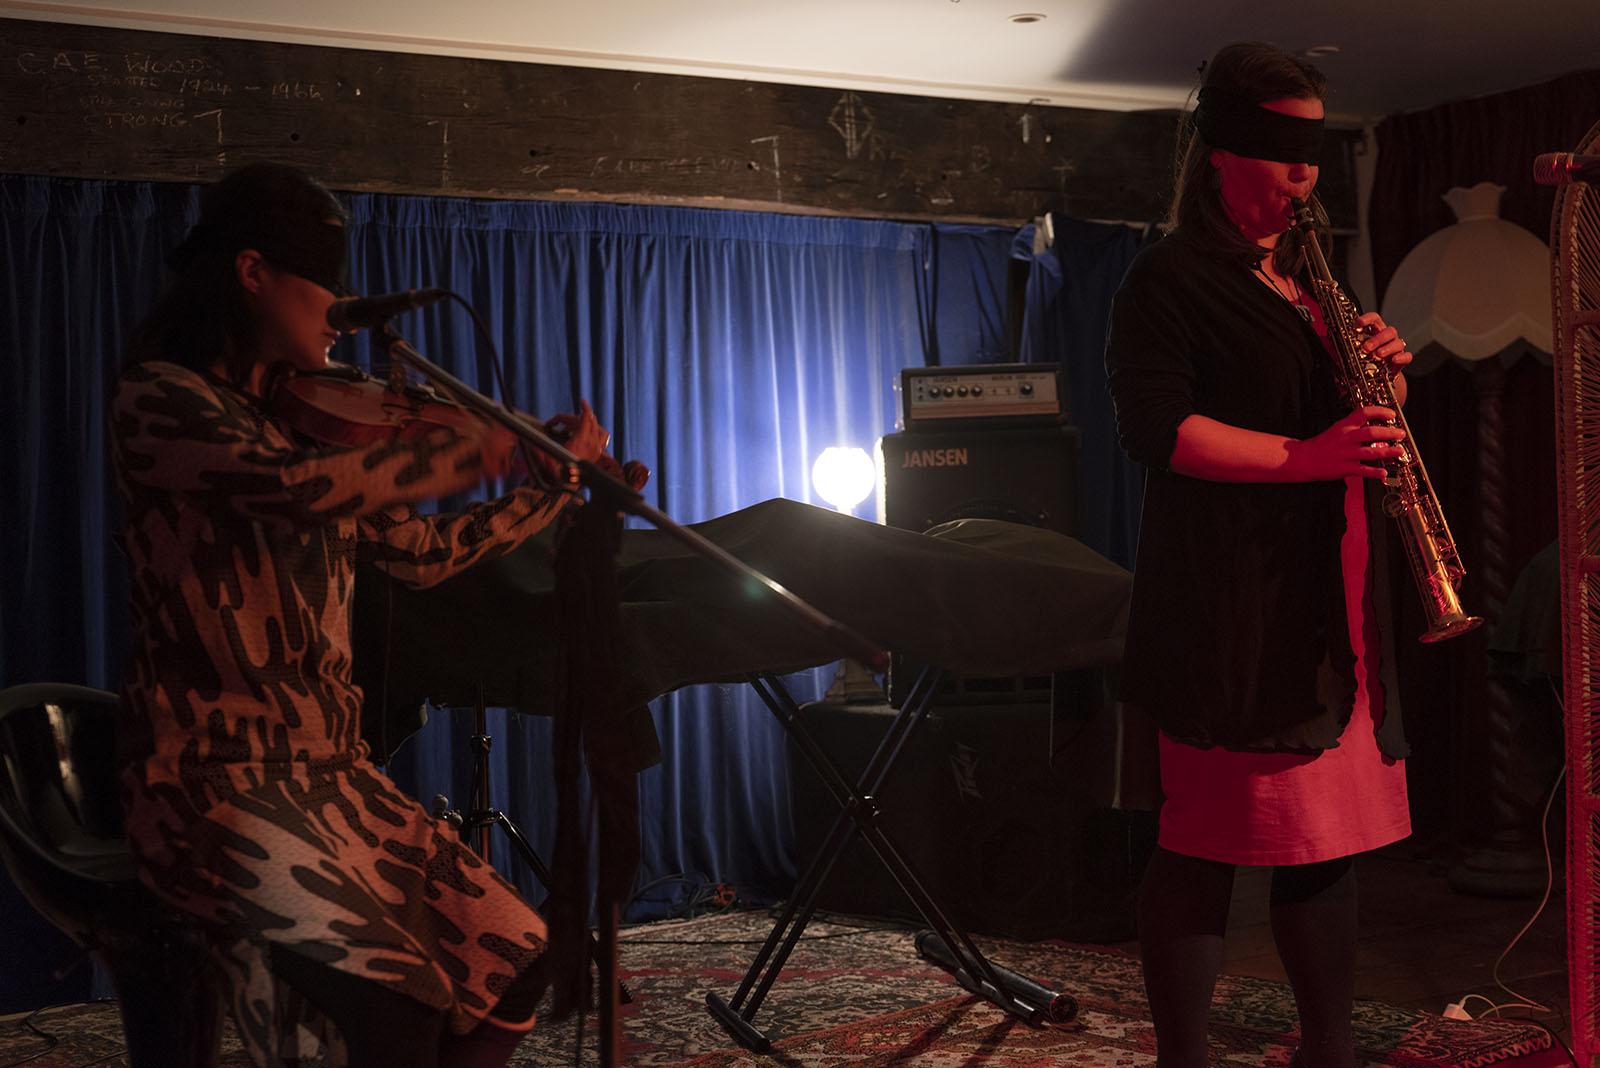 Motoko Kikkawa and Blue Oyster present BLIND JAM #3, 19 September, Pyramid Club. Photo by John Lake